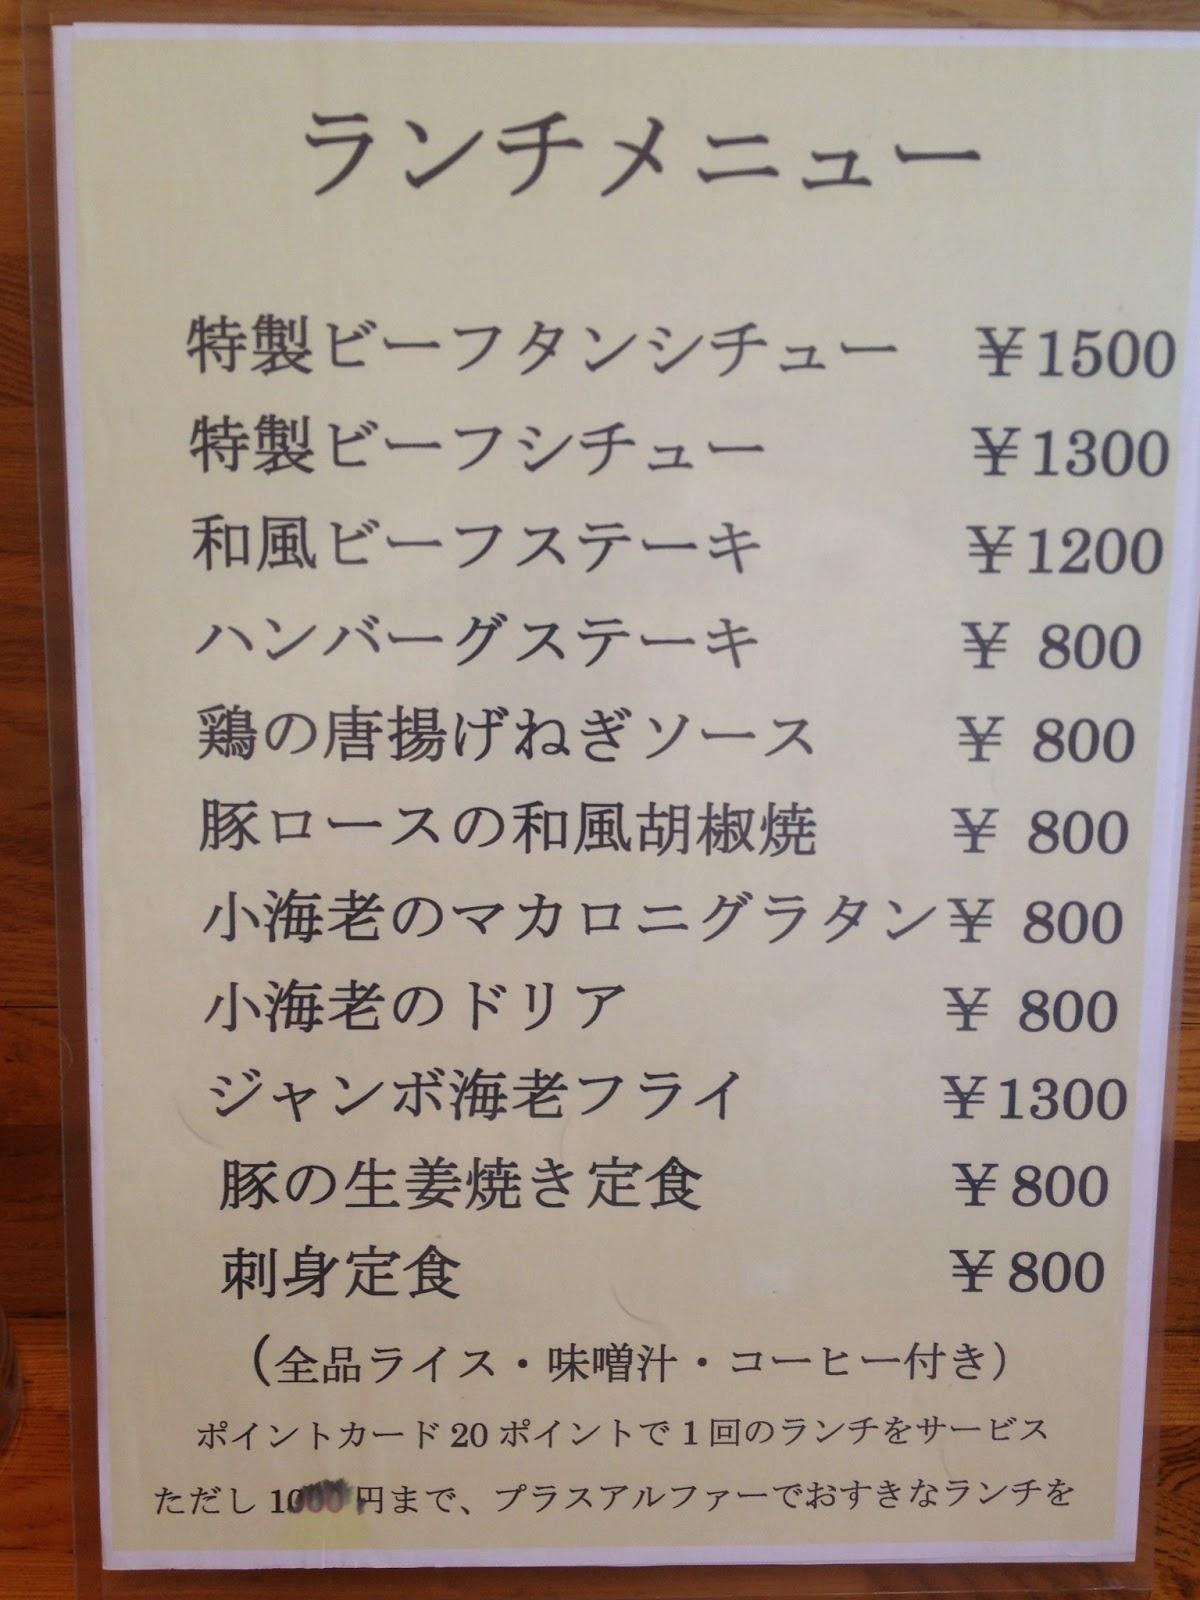 english to japanese writing